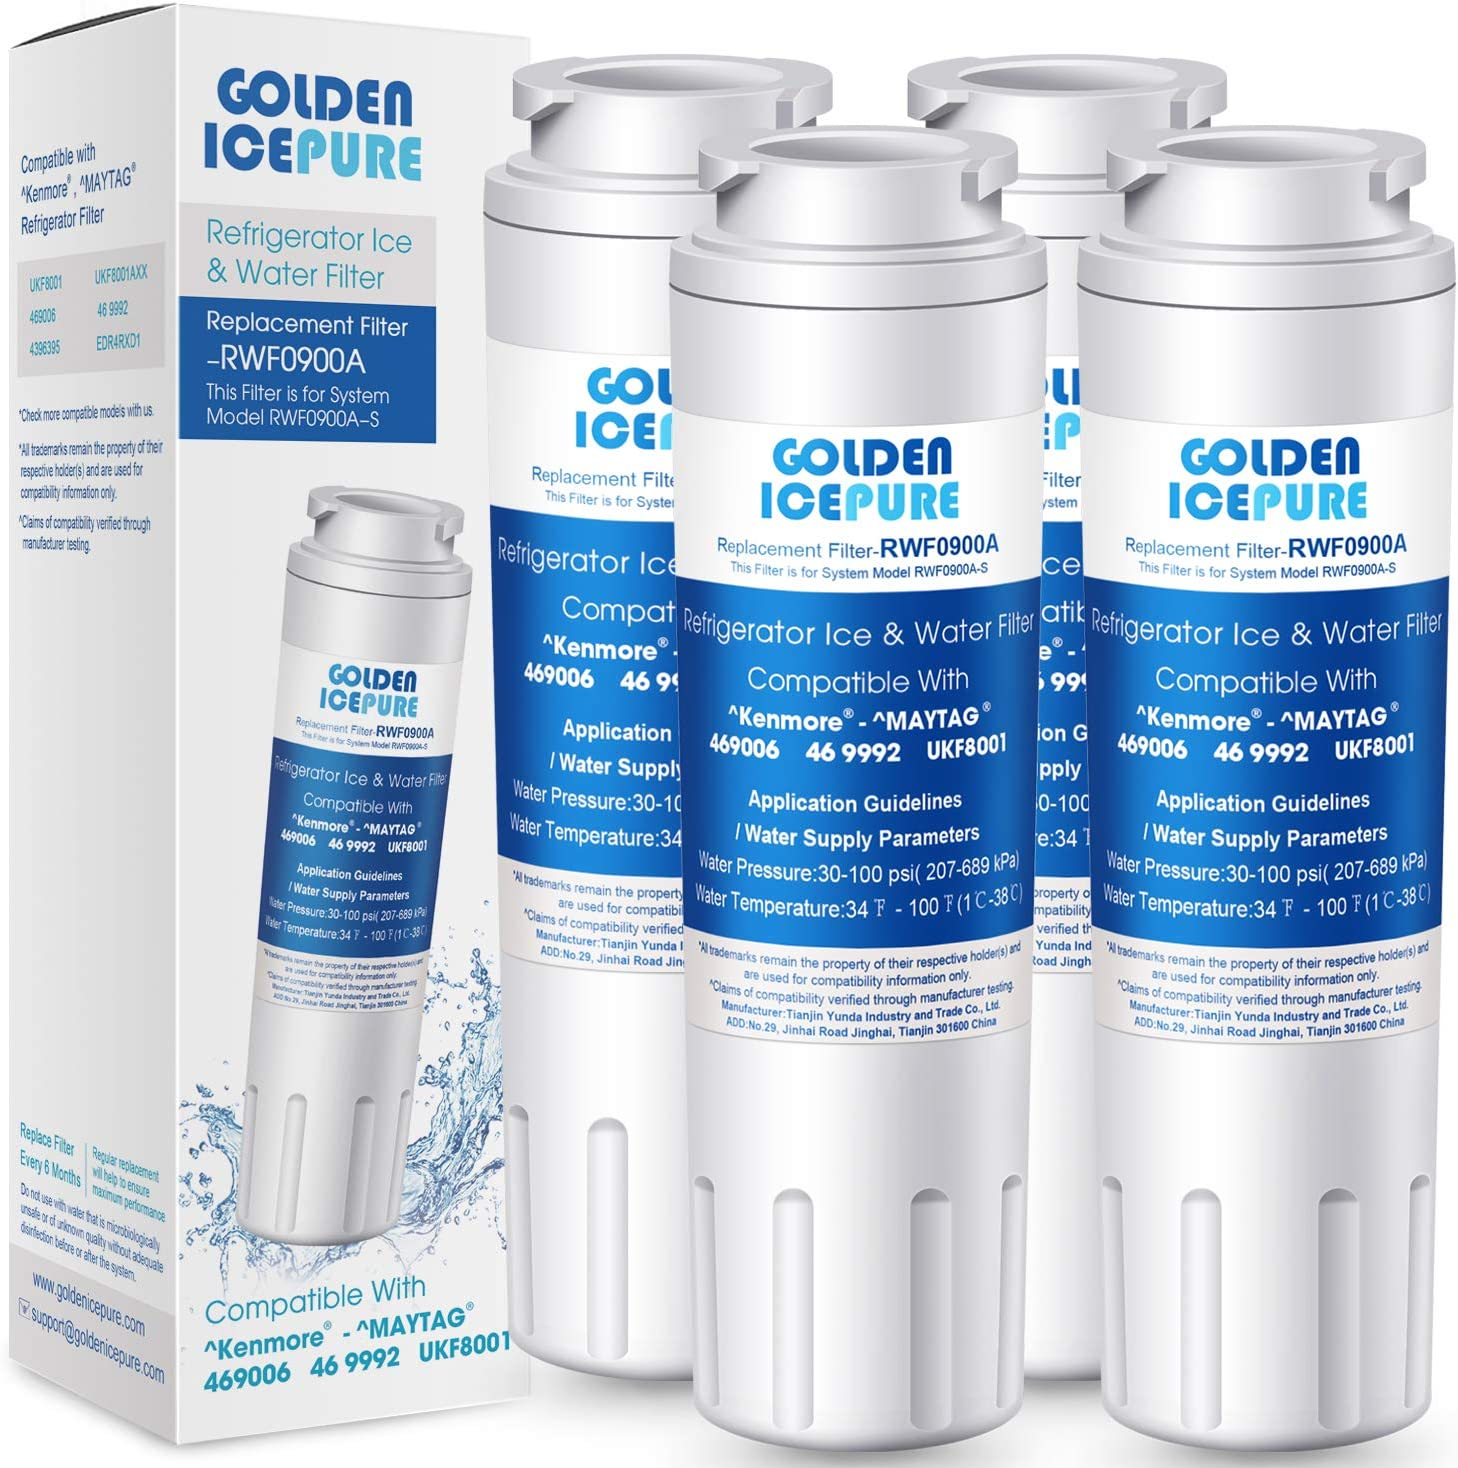 GOLDEN ICEPURE UKF8001 Replacement Filter 4 EveryDrop EDR4RXD1 Wrx735sdbm00, Mfi2570fez Msd2651heb, Krfc300ess01, 469006, RWF0900A Refrigerator Water Filter 4pack